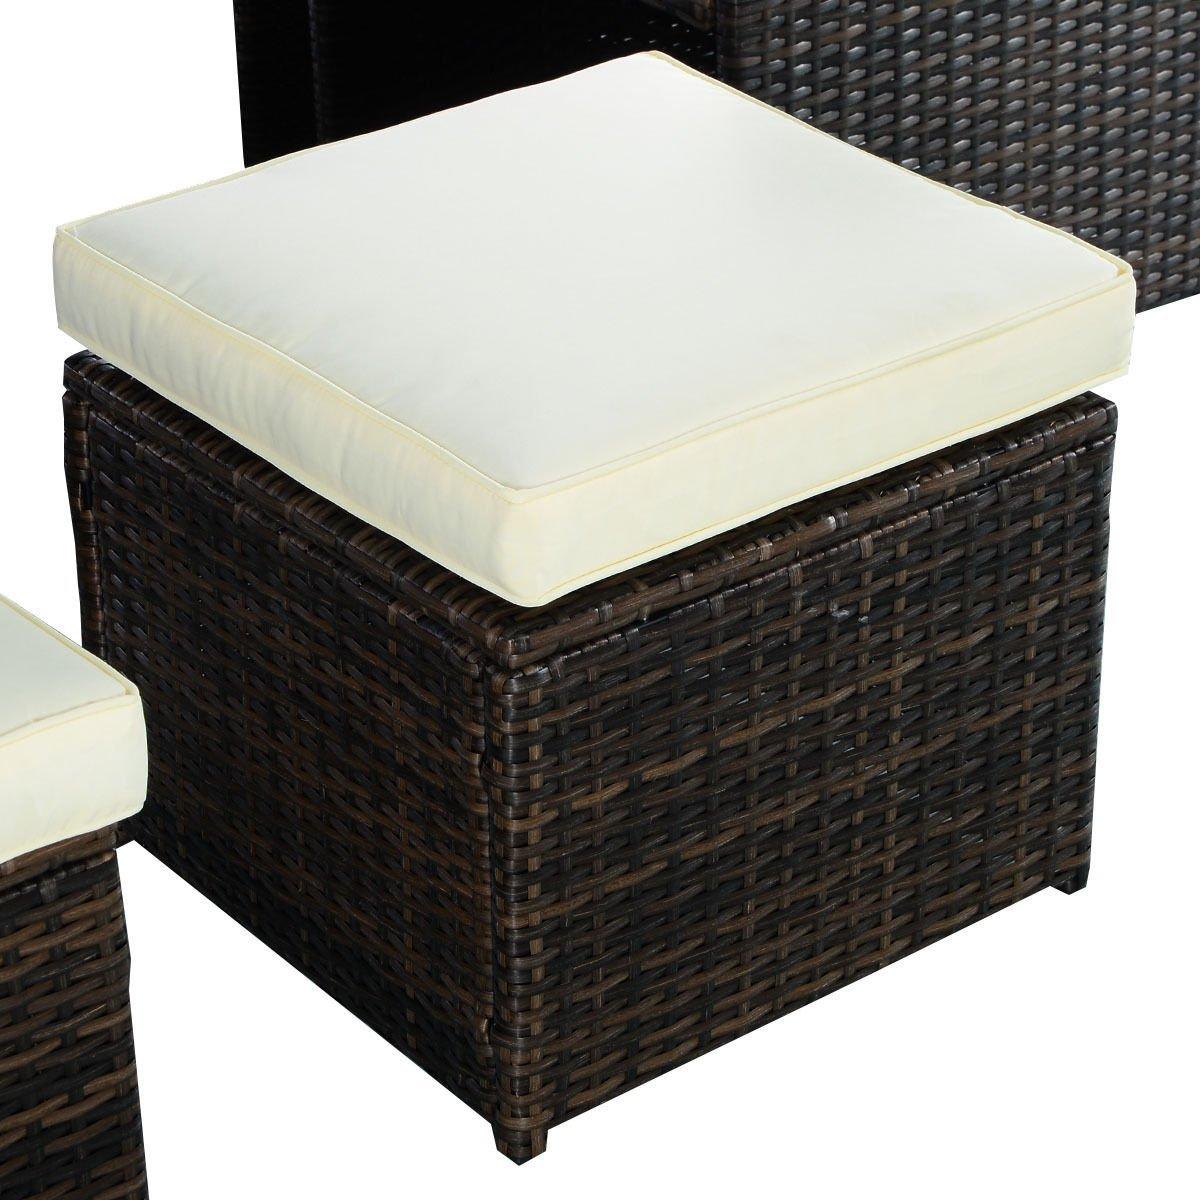 Amazon.com: Tangkula 9 PCS Outdoor Patio Garden Rattan Wicker Sofa ...